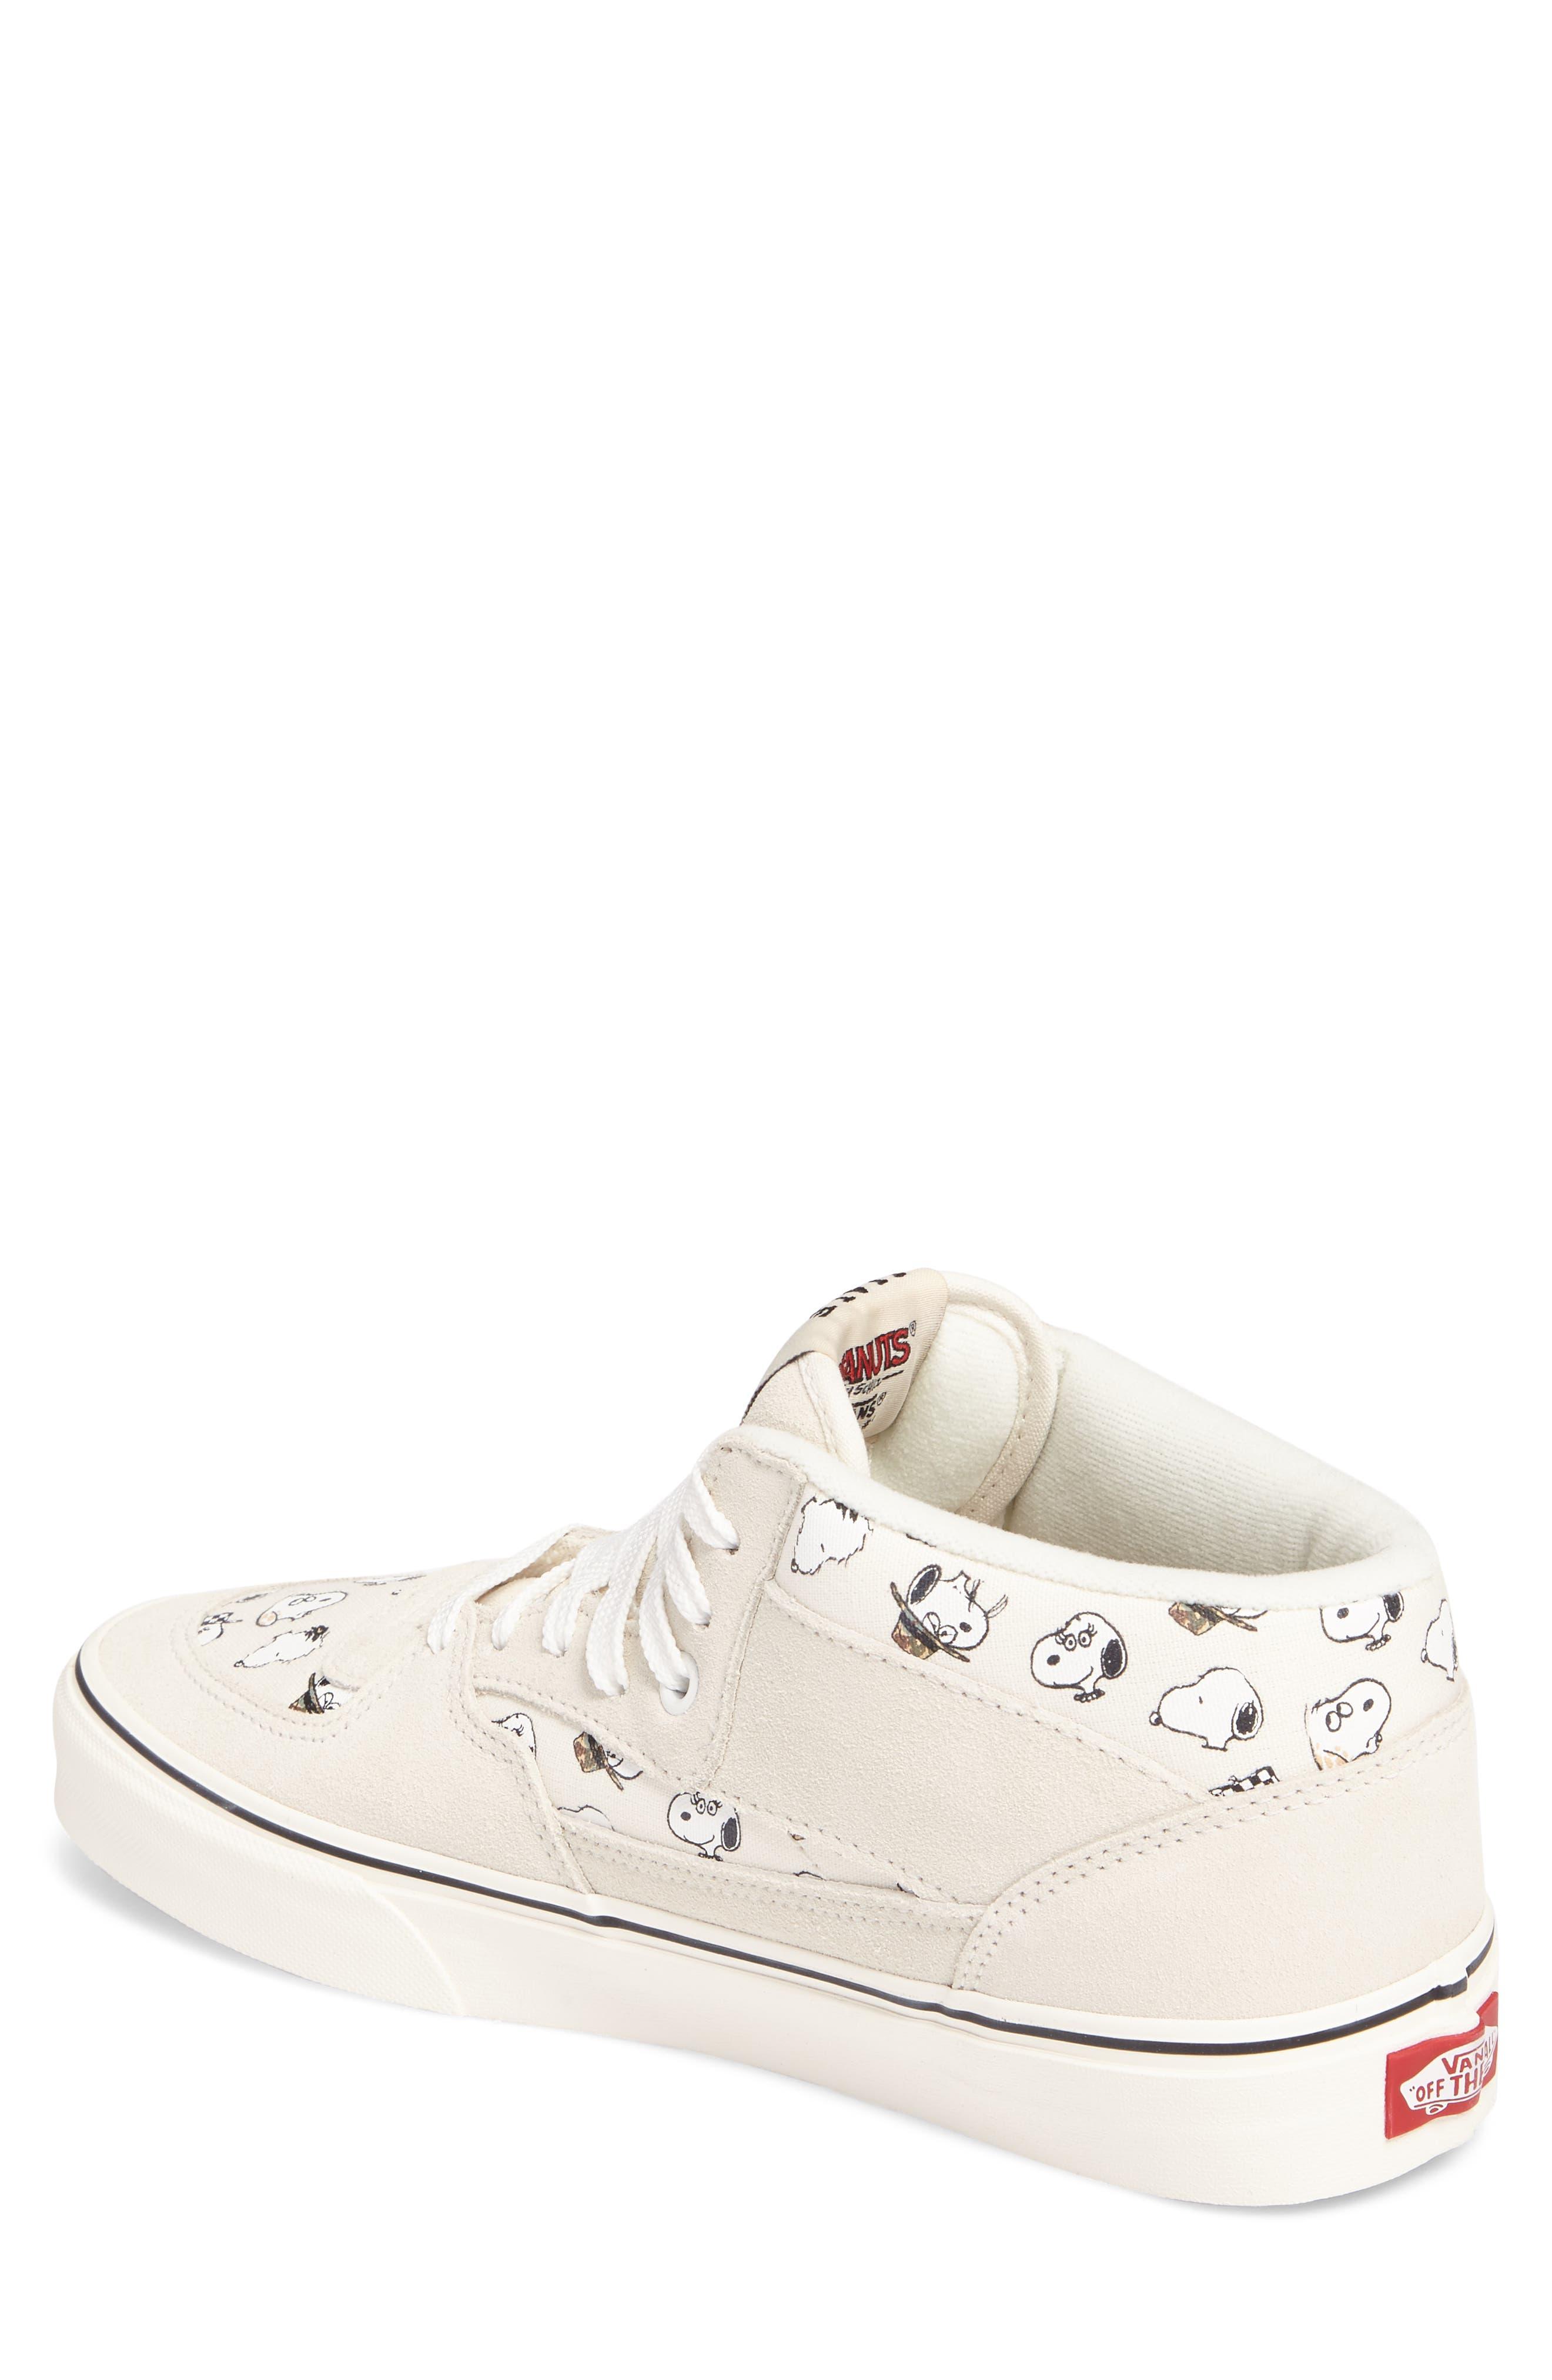 x Peanuts<sup>®</sup> Half Cab Sneaker,                             Alternate thumbnail 2, color,                             100